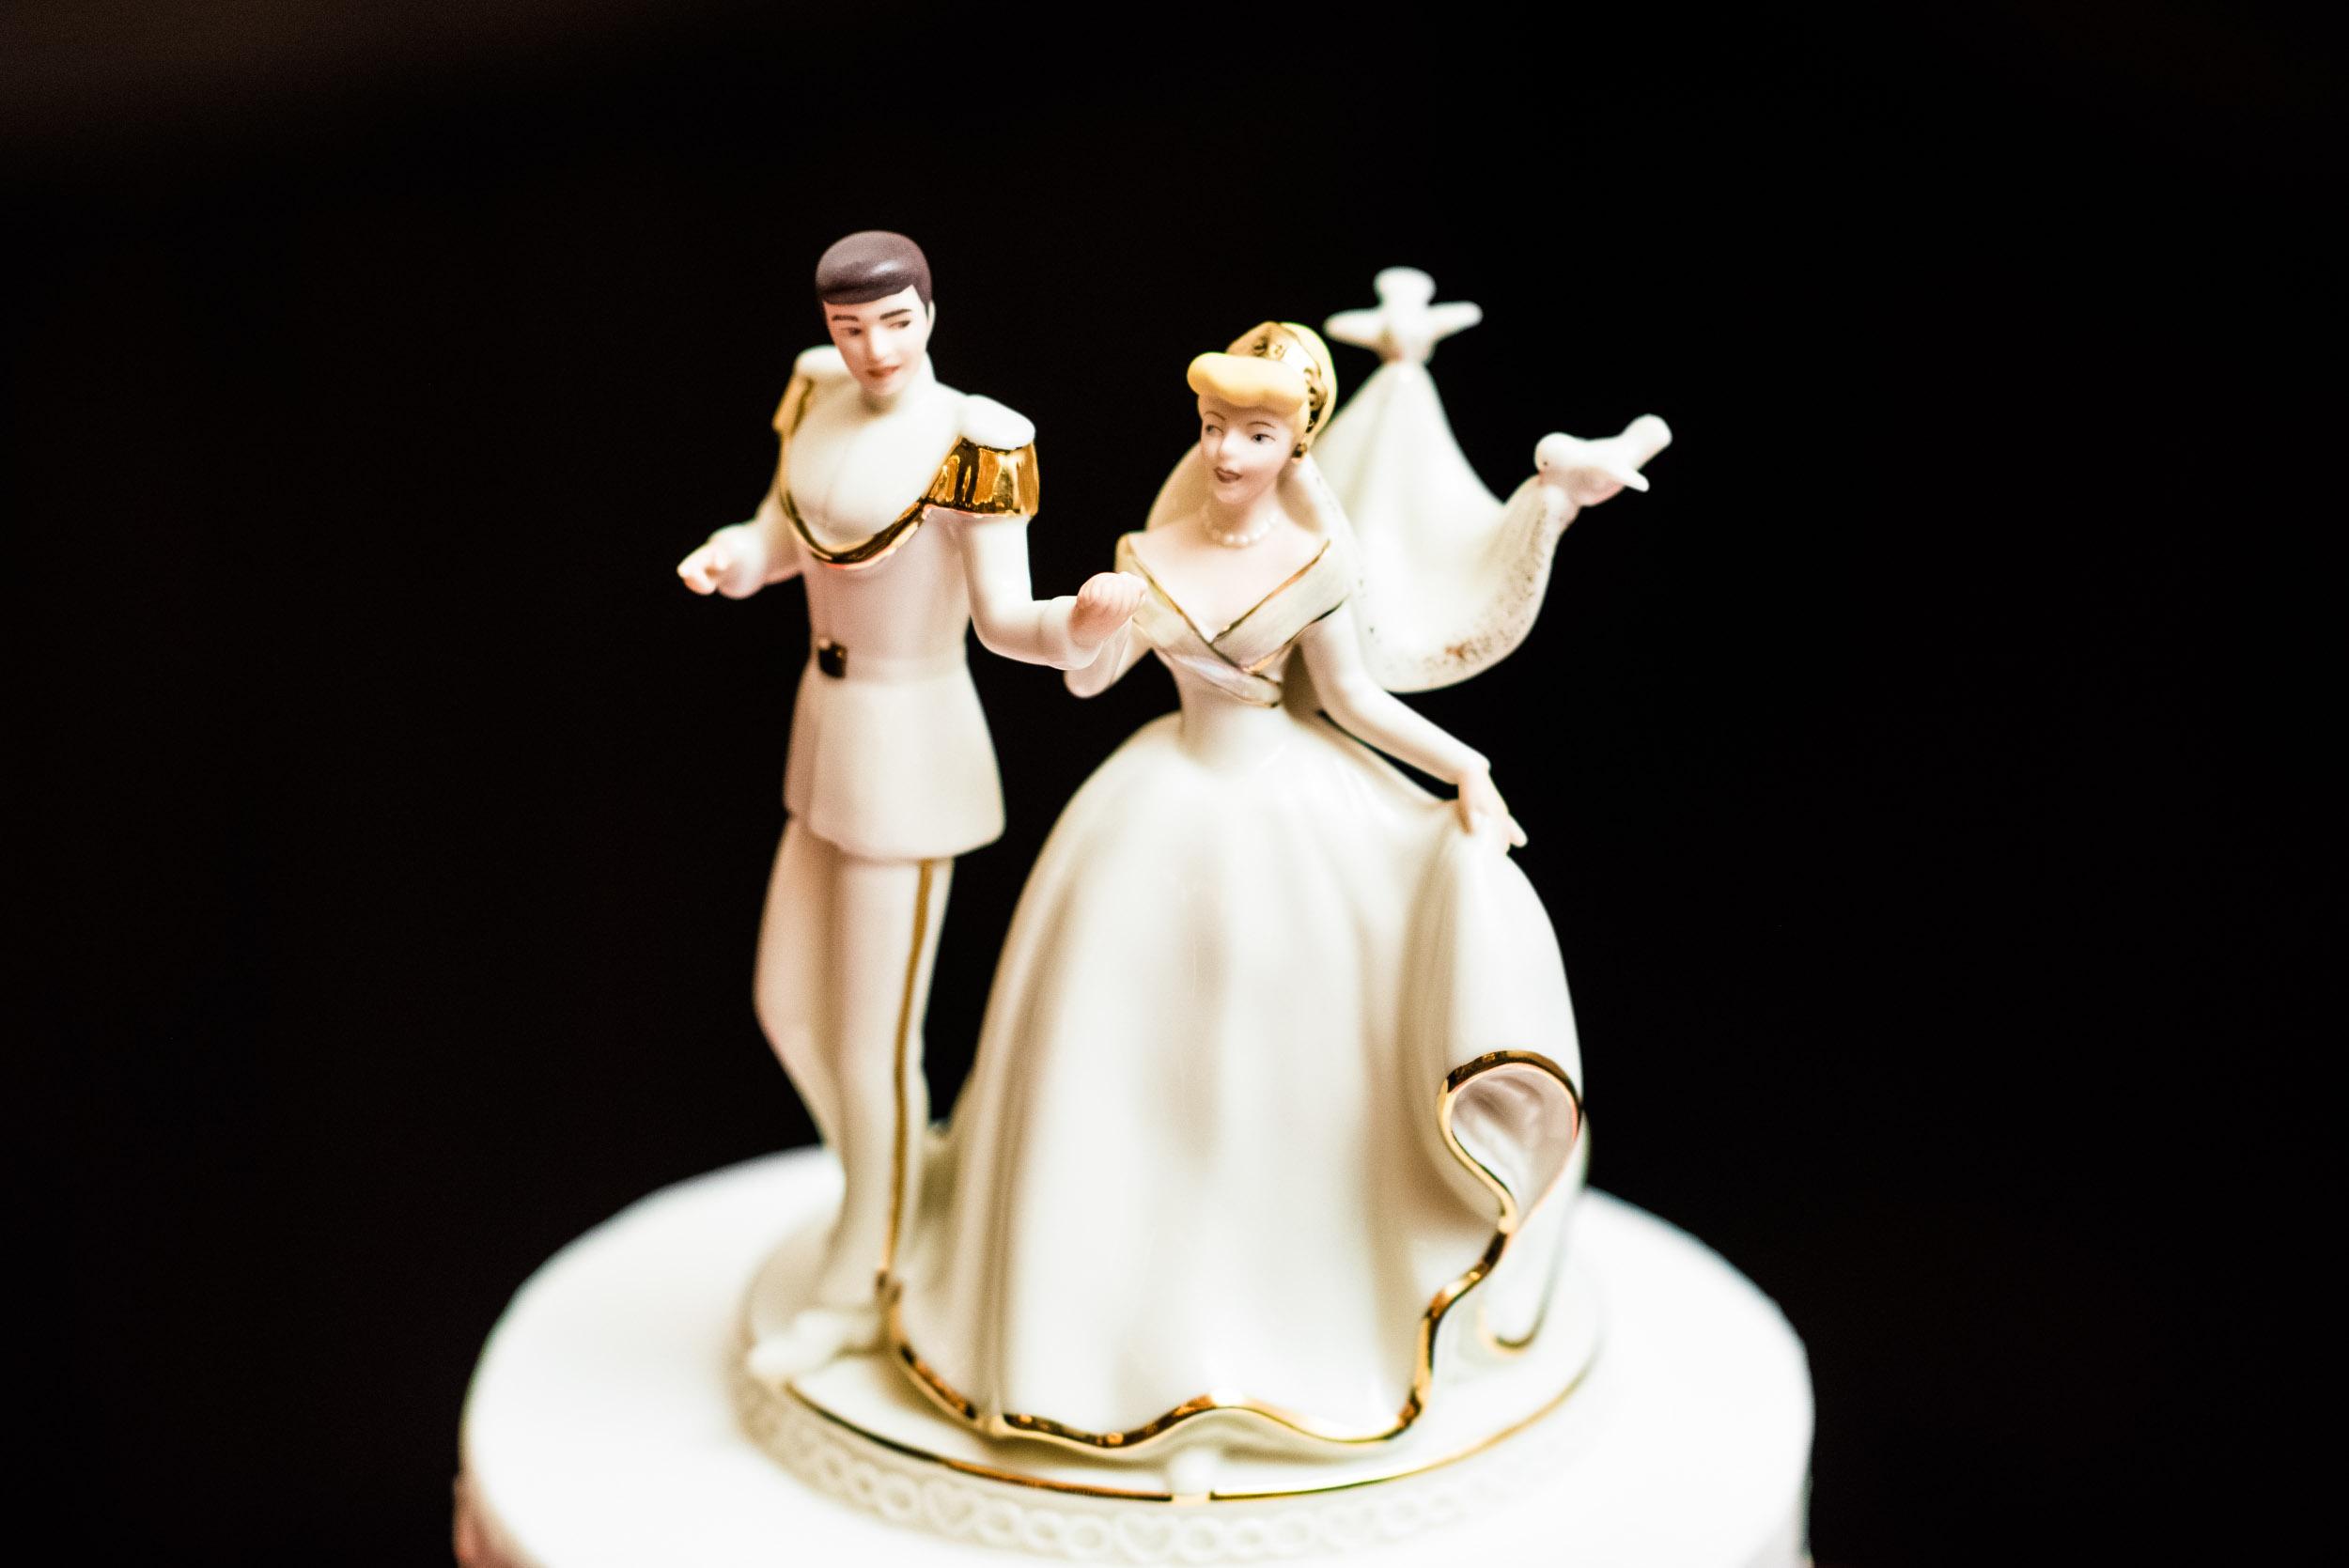 dc+metro+wedding+photographer+vadym+guliuk+photography+wedding+cake-2020.jpg